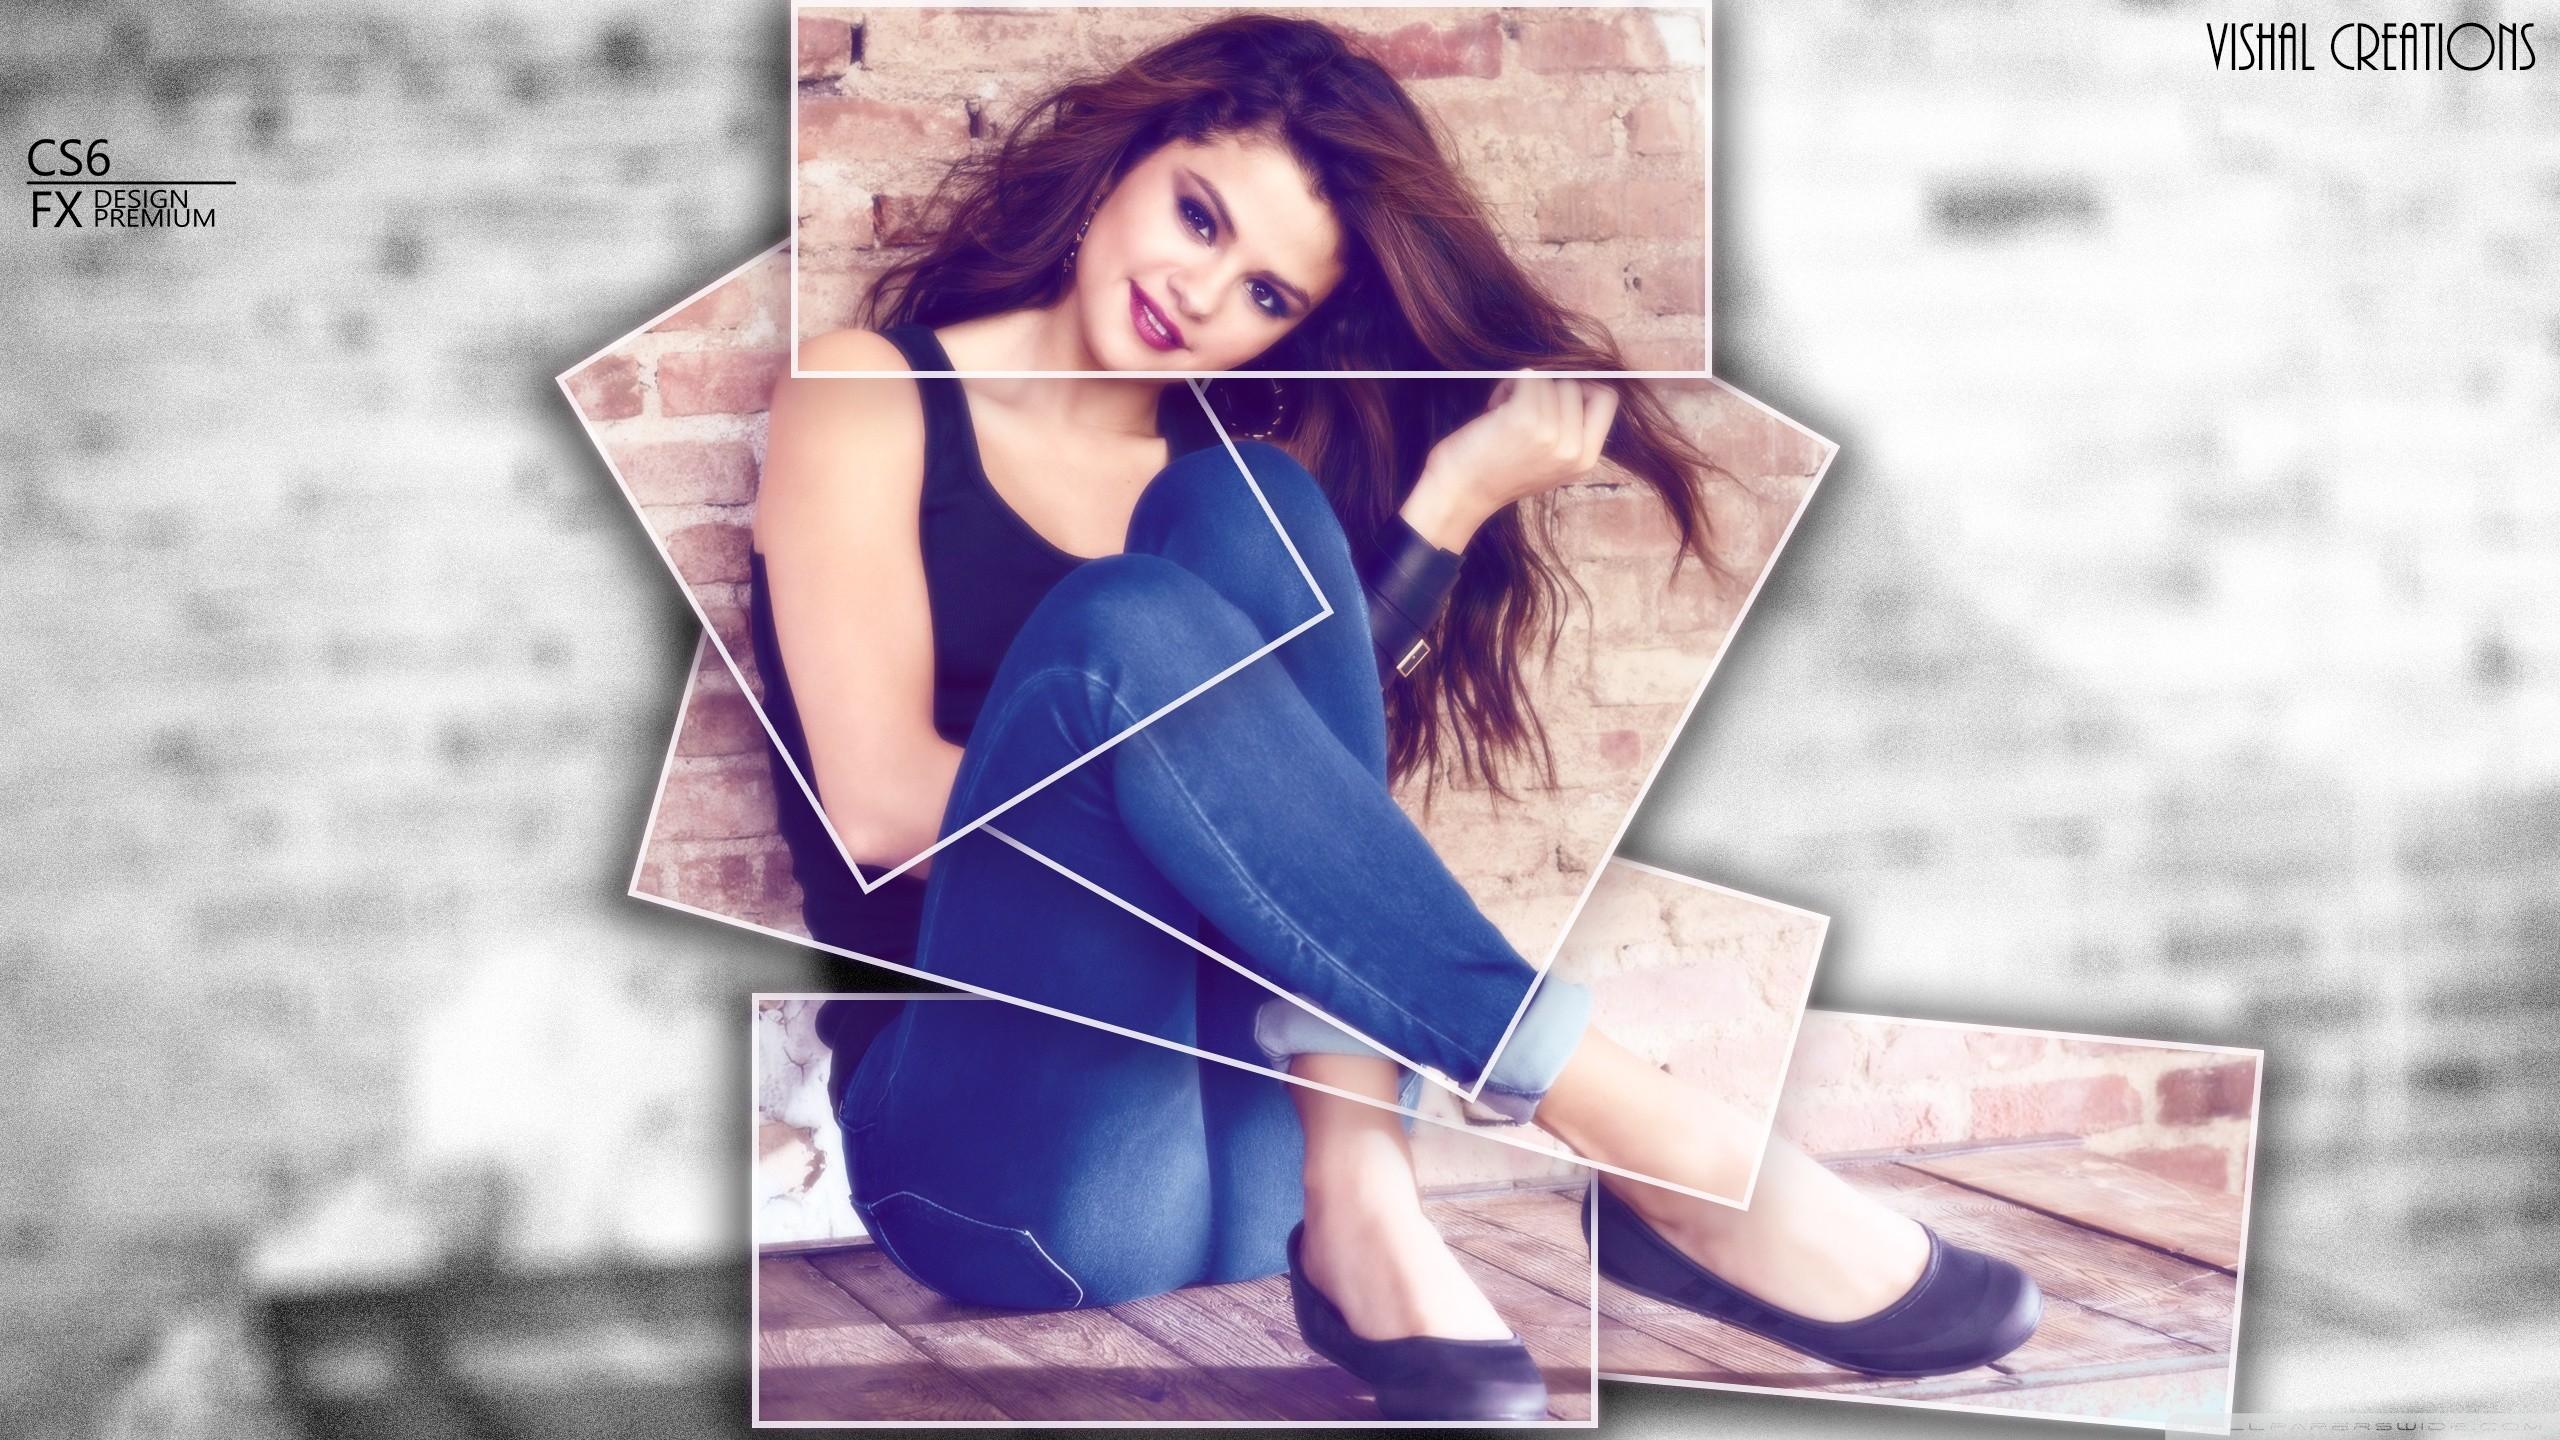 Selena gomez desktop wallpaper 84 images - Selena gomez 4k ultra hd wallpapers ...